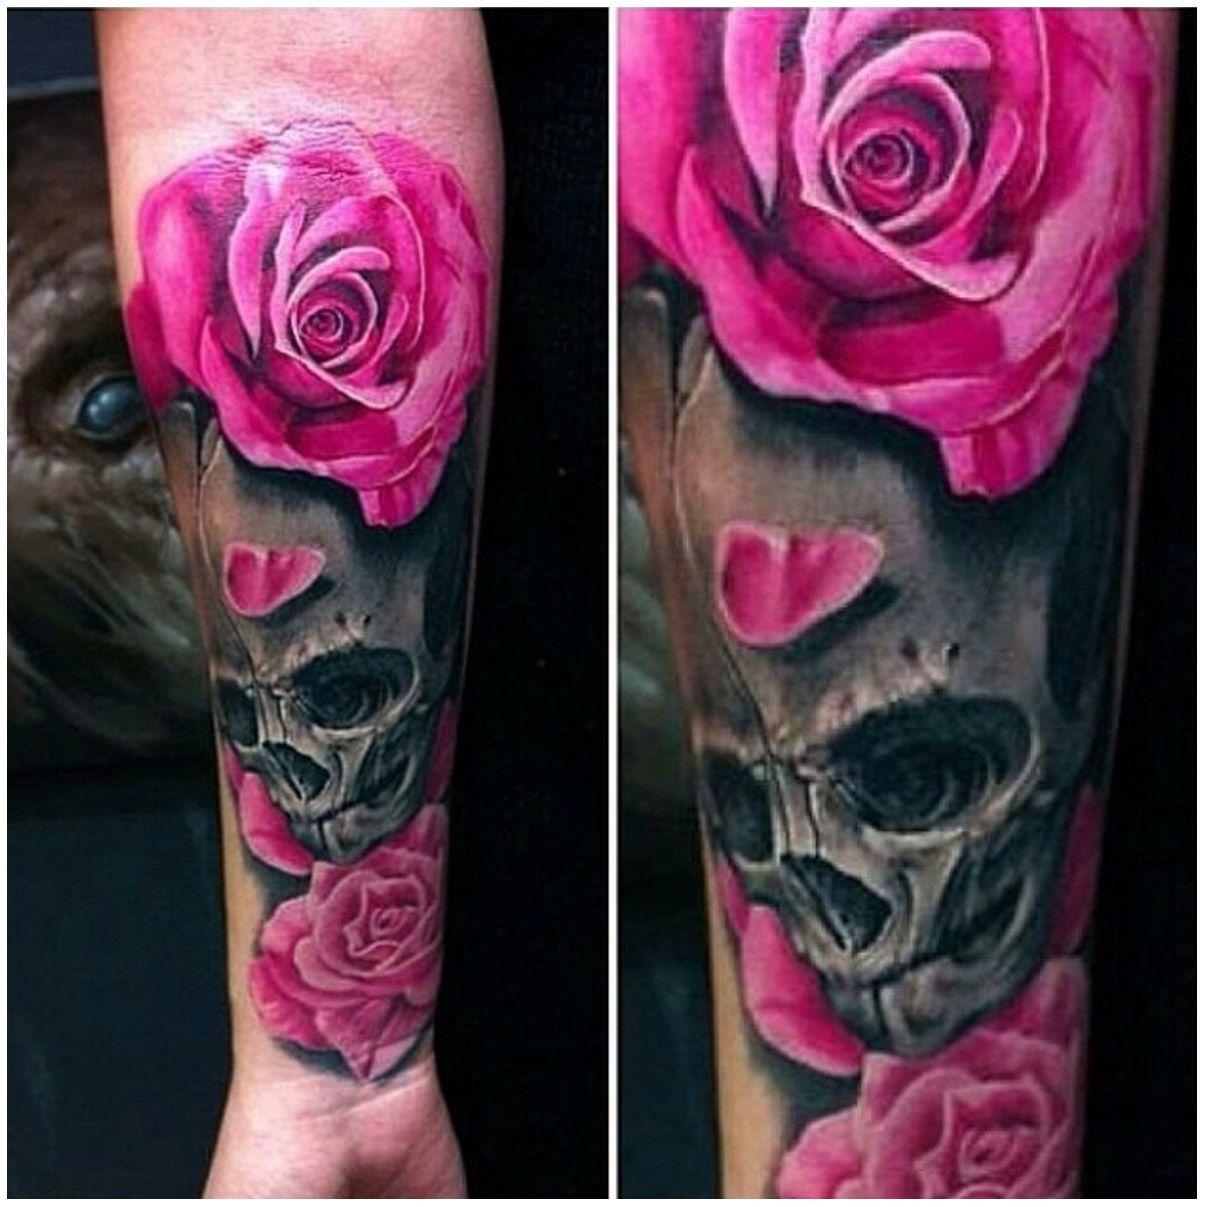 girl sugar skull tattoo google search girl tattoos pinterest sugar skull tattoos sugar. Black Bedroom Furniture Sets. Home Design Ideas